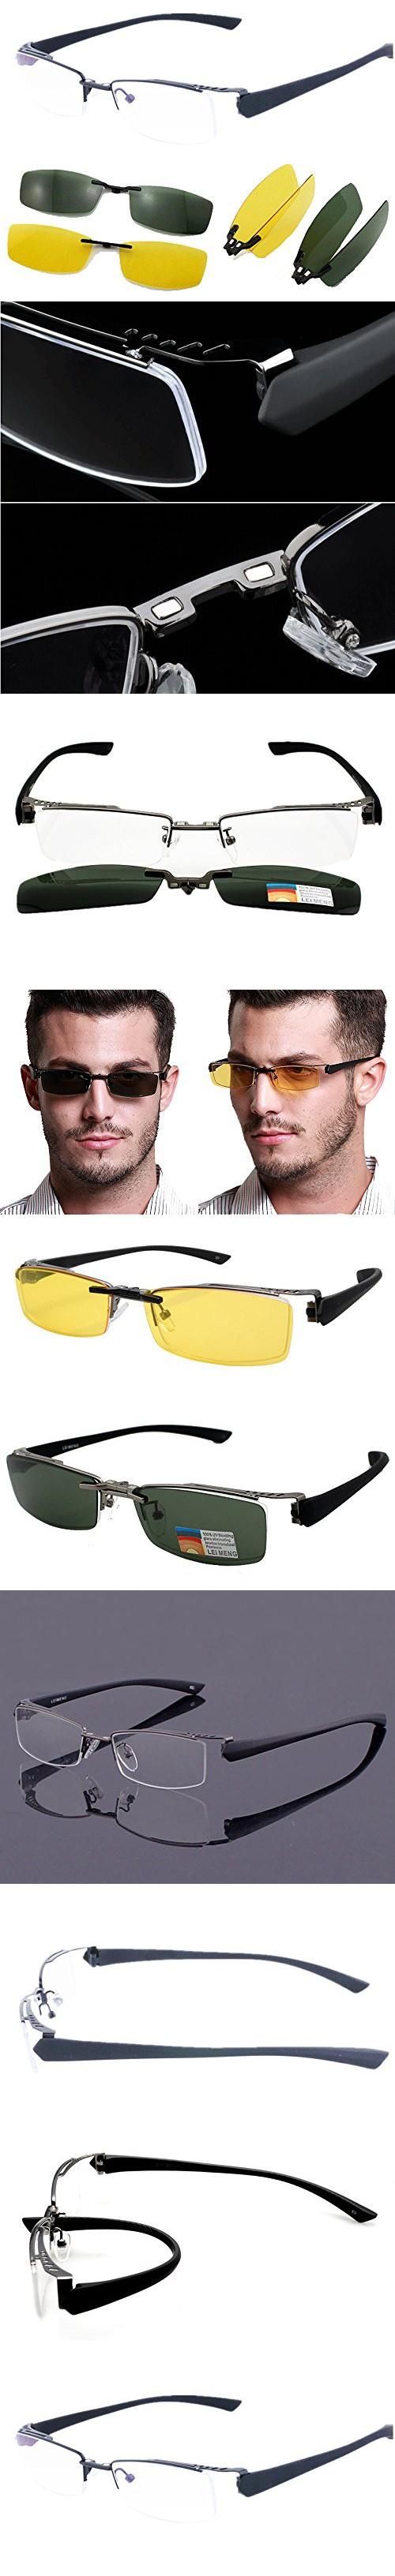 f18c75f695d Agstum Mens Half Rimless Myopia Glasses Frame Magnetic Clip On Sunglasses  (Gunmetal frame with 2pcs clip on